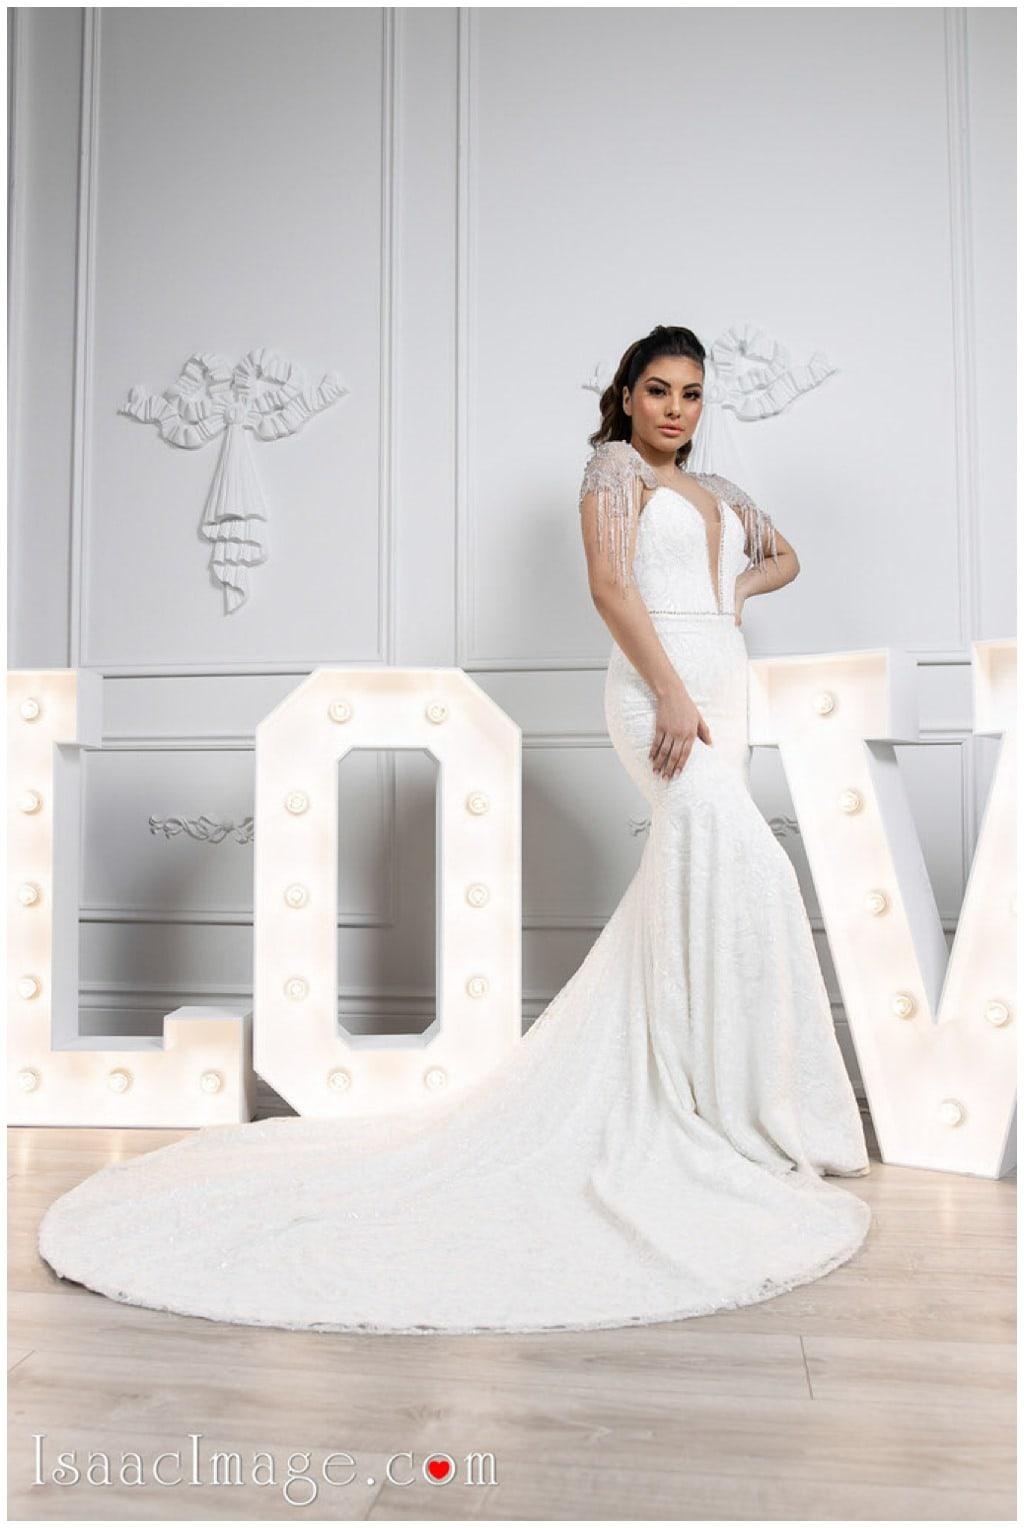 Toronto top bridal show_6757.jpg